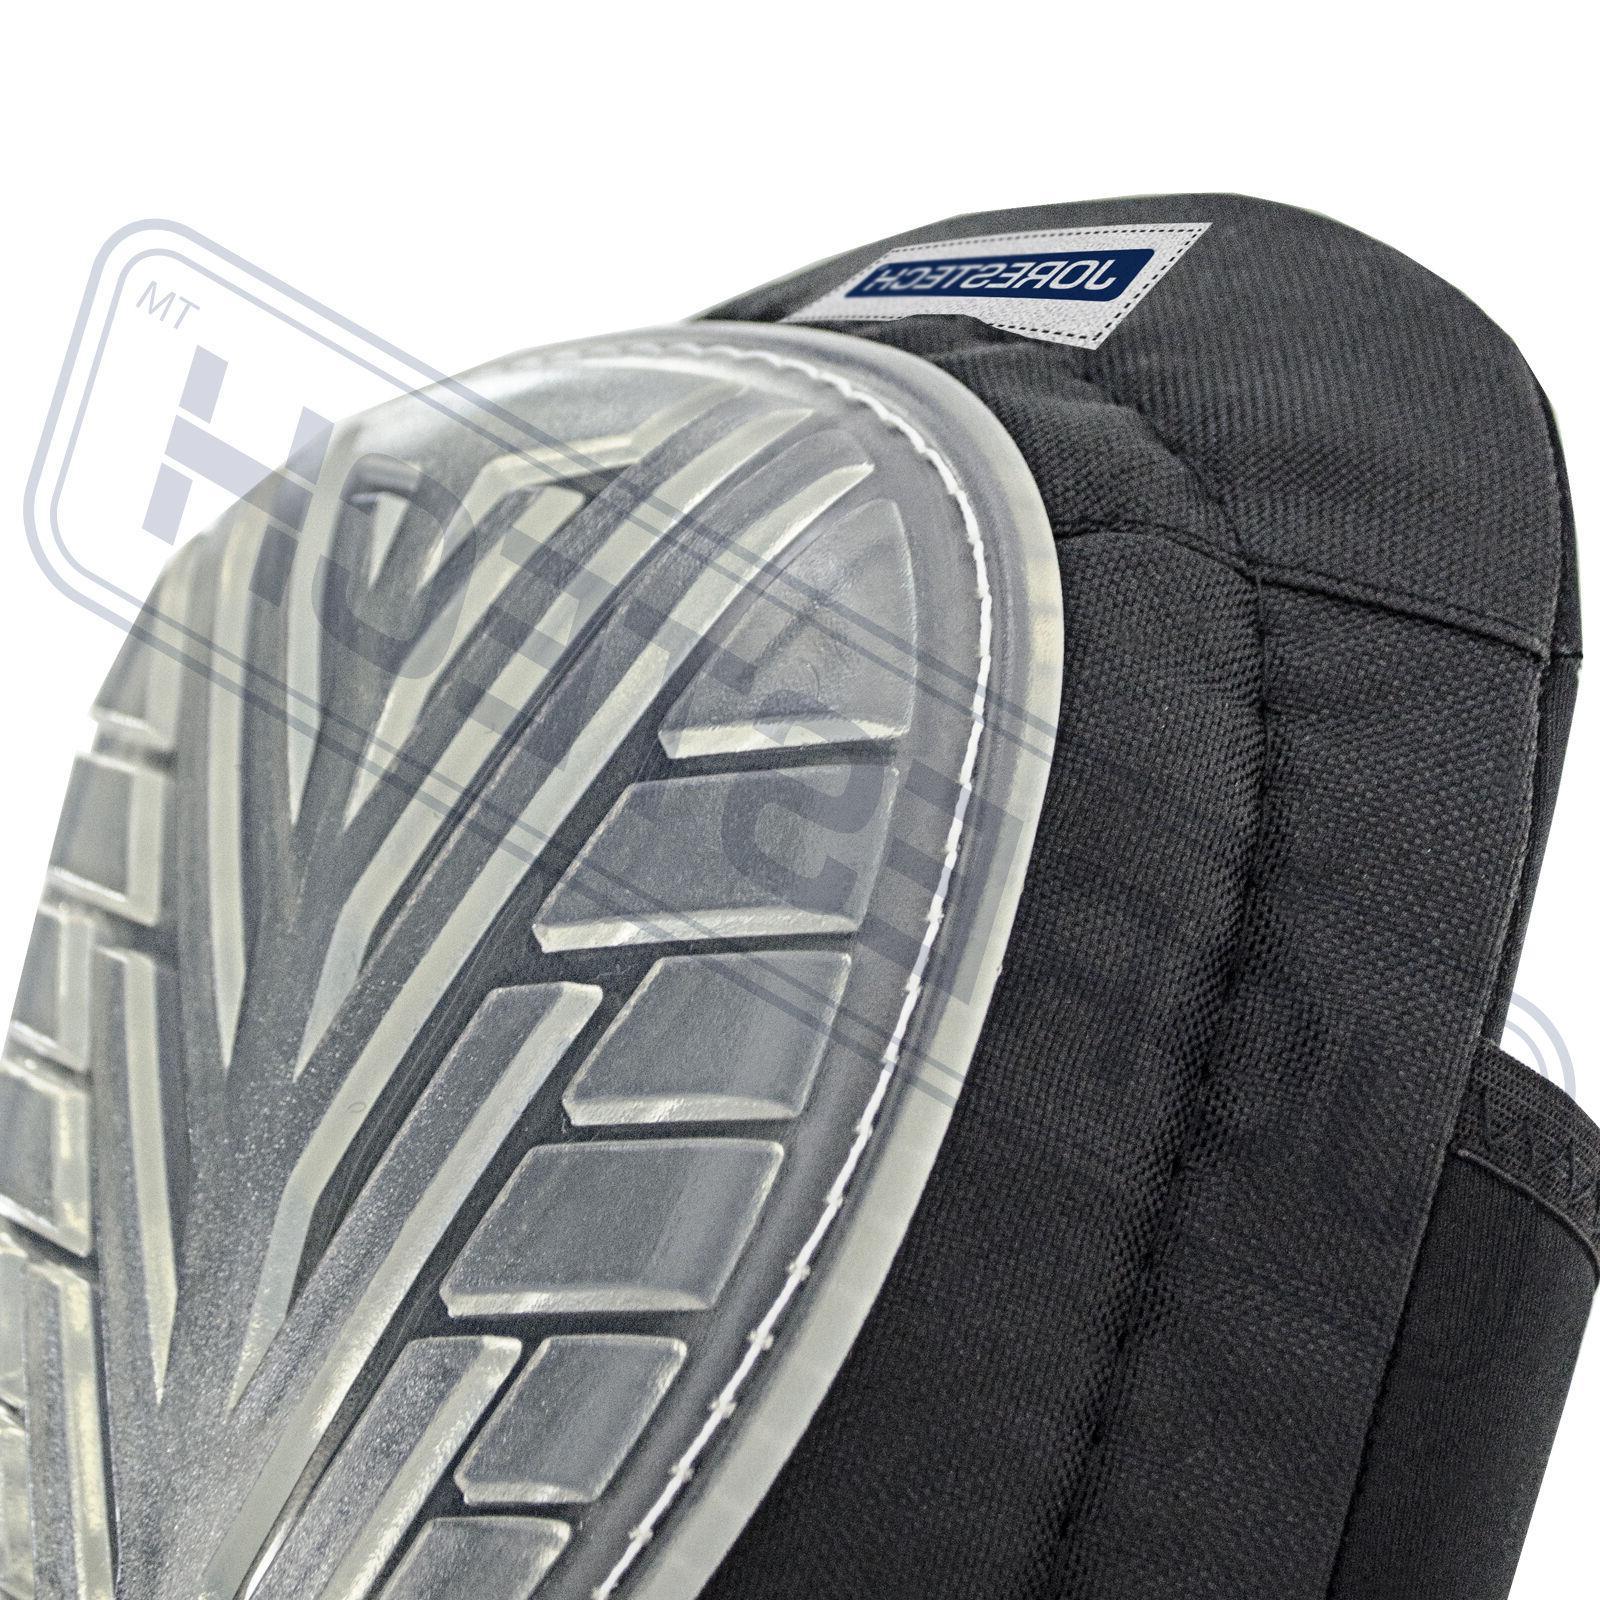 Construction Gel Knee Safety Leg Protectors Comfort